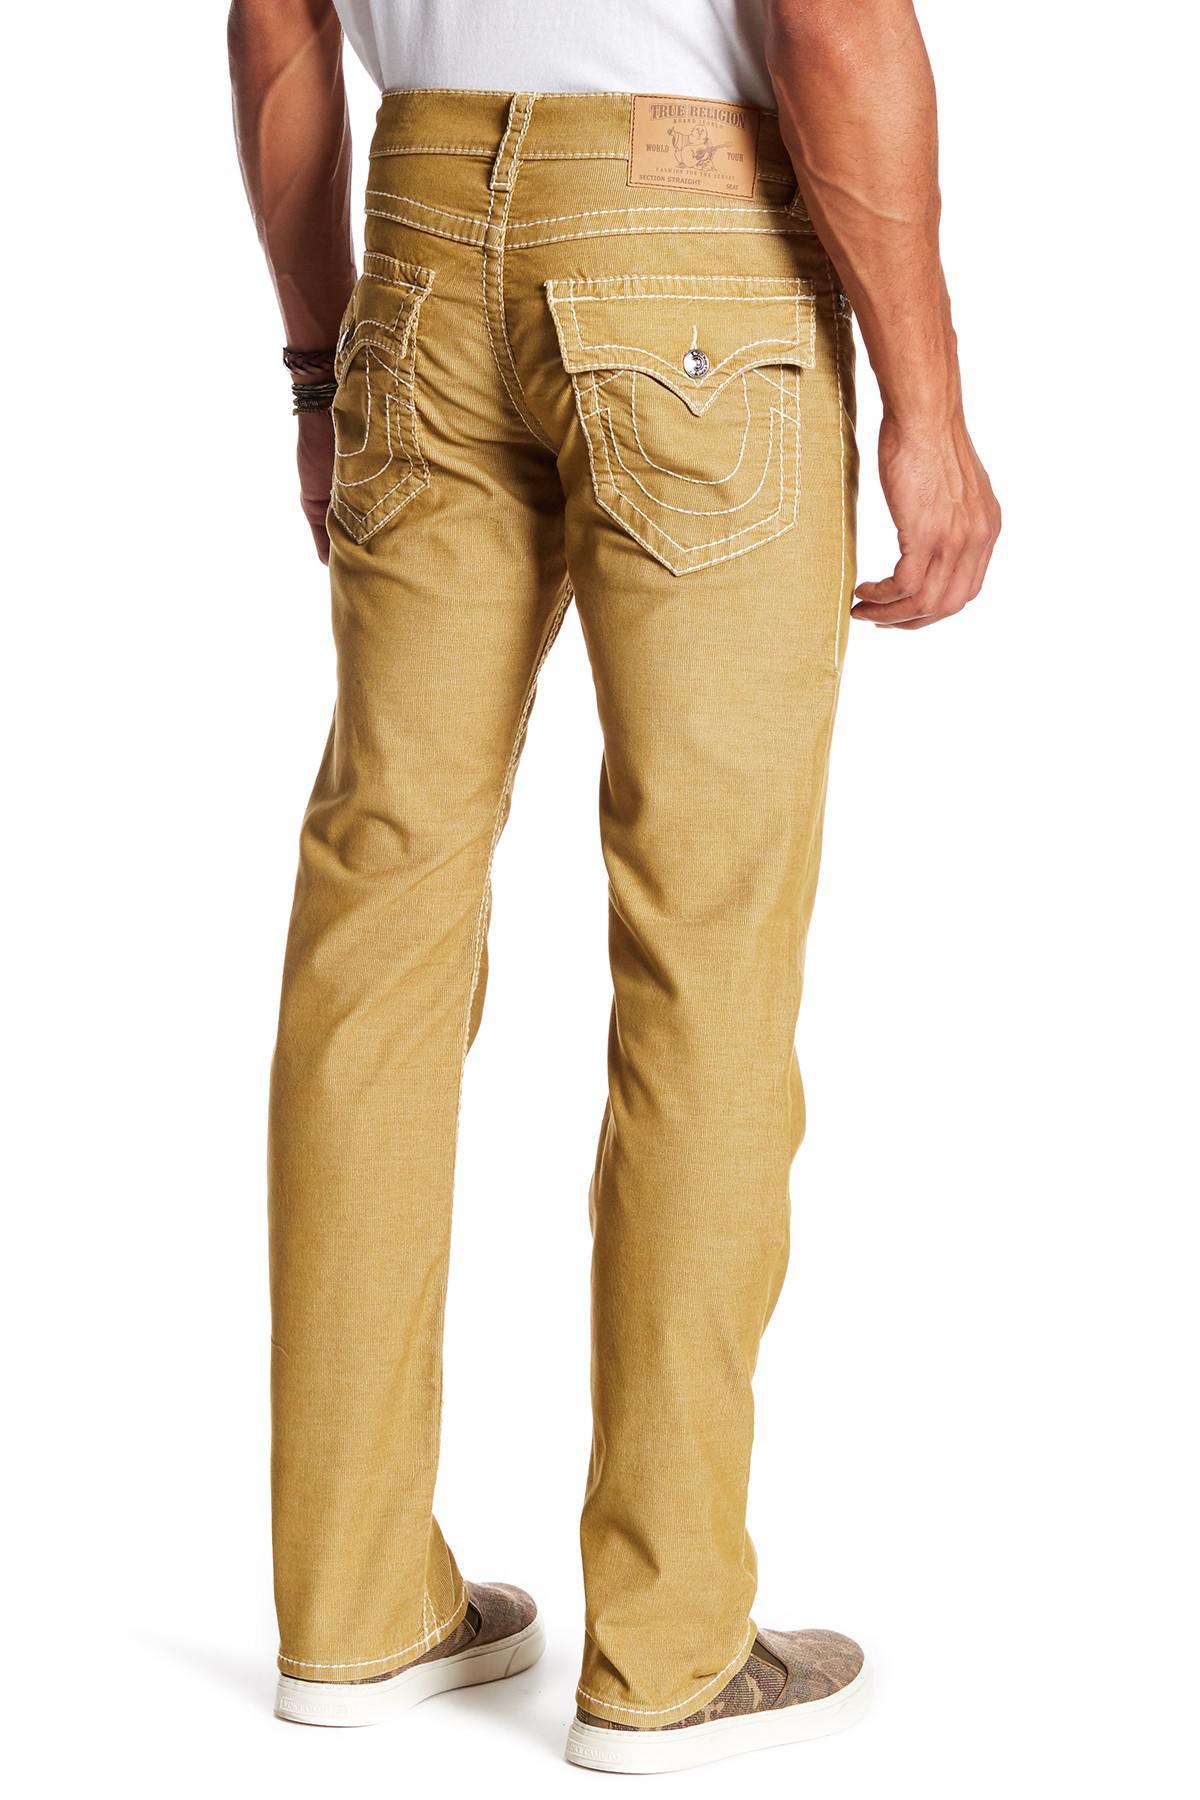 5345539d3 Lyst - True Religion Straight Leg Flap Pocket Corduroy Pants in ...